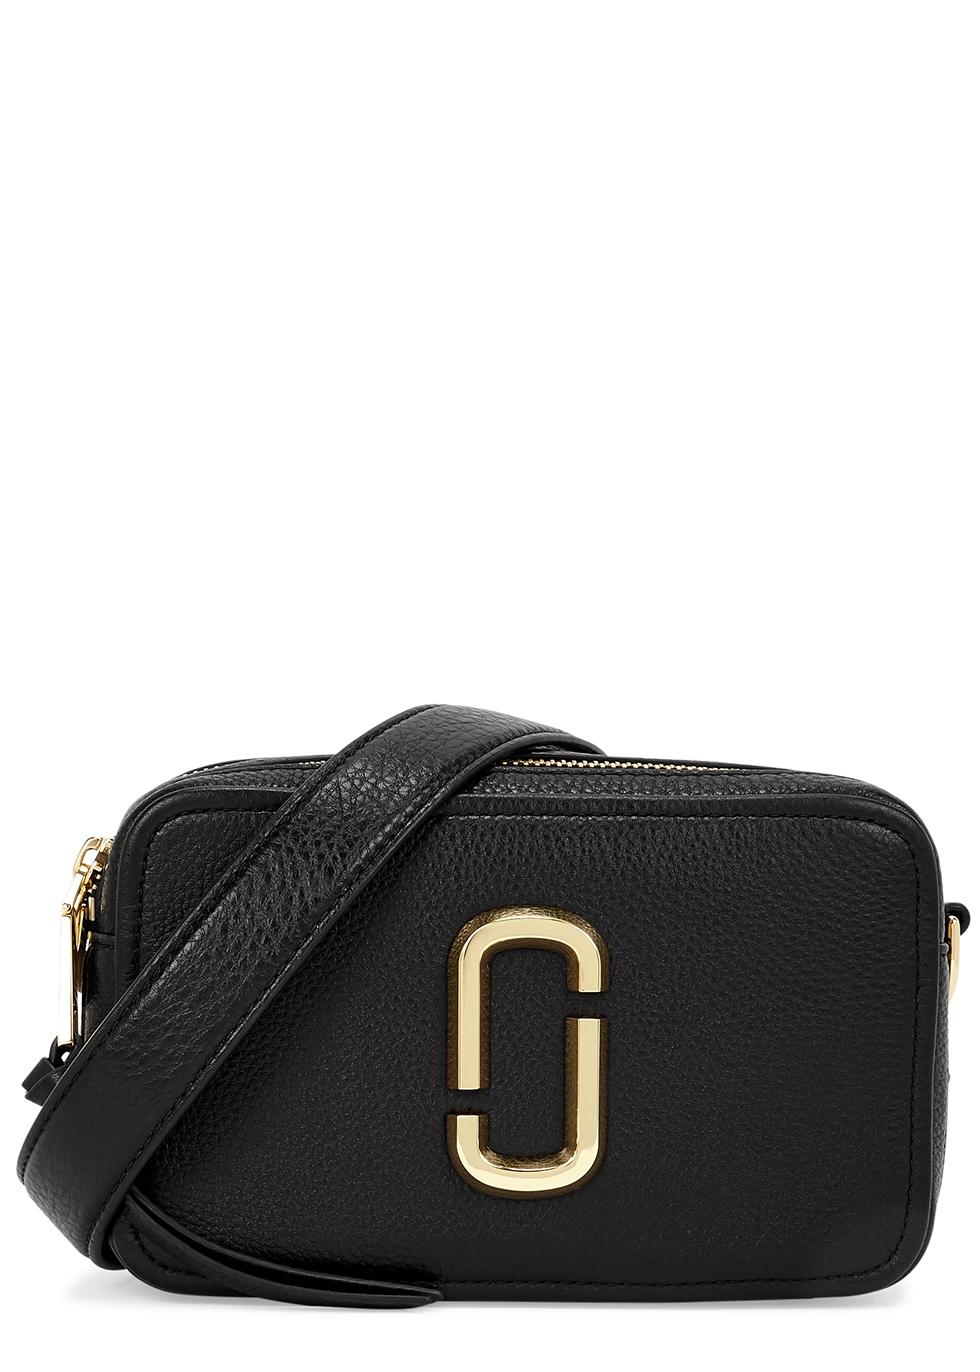 The Softshot 21 black leather cross-body bag